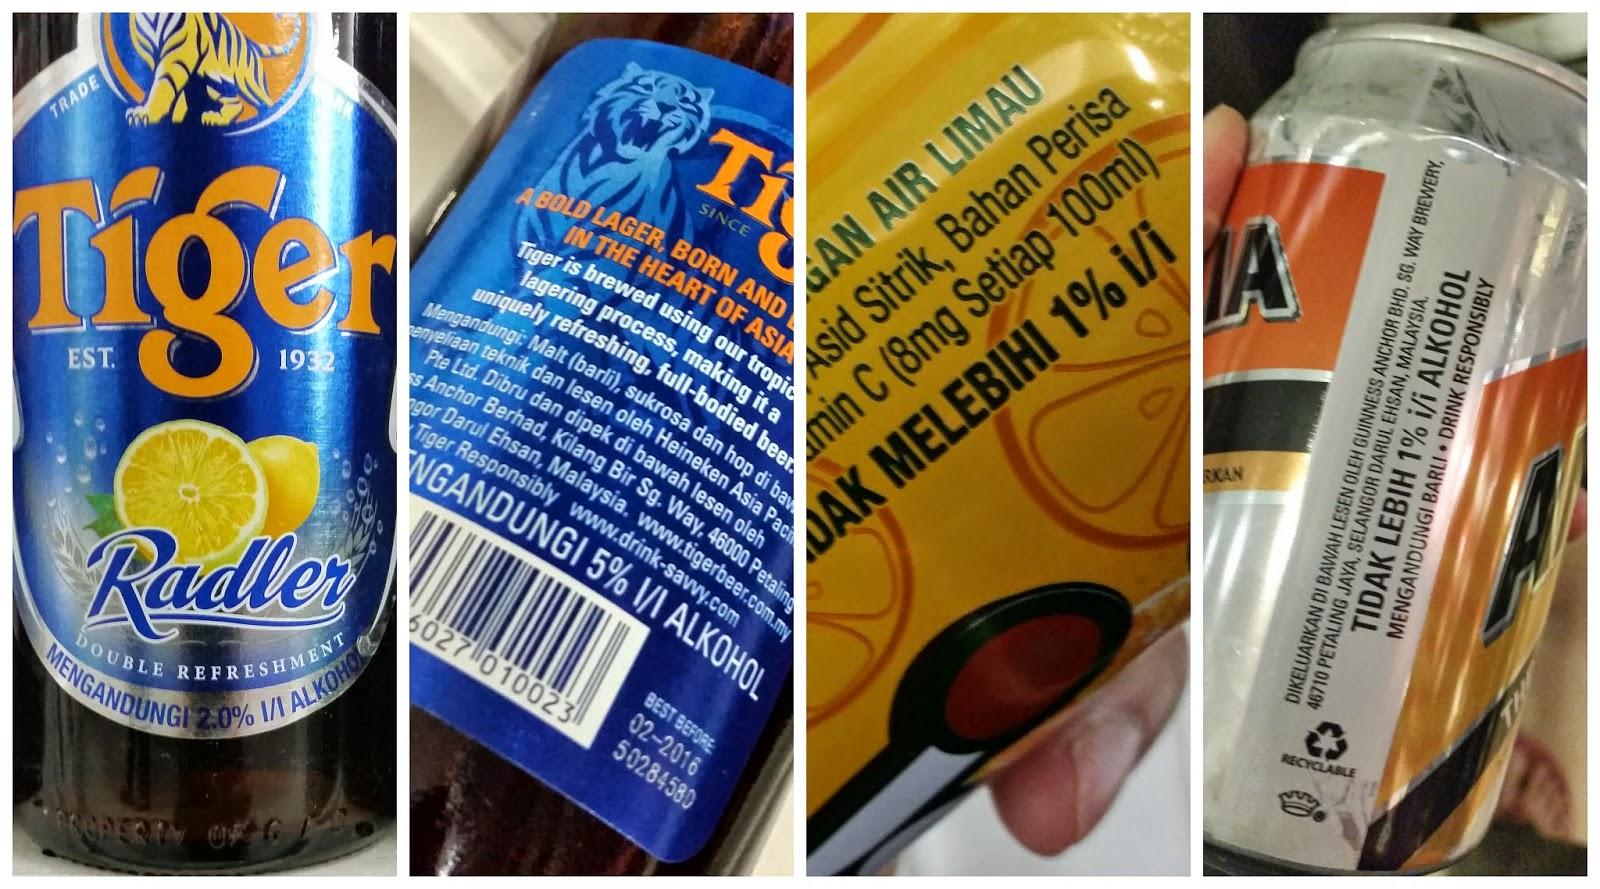 Angeltini The Booze Blog Tiger Beer Vs Tiger Radler Whats The